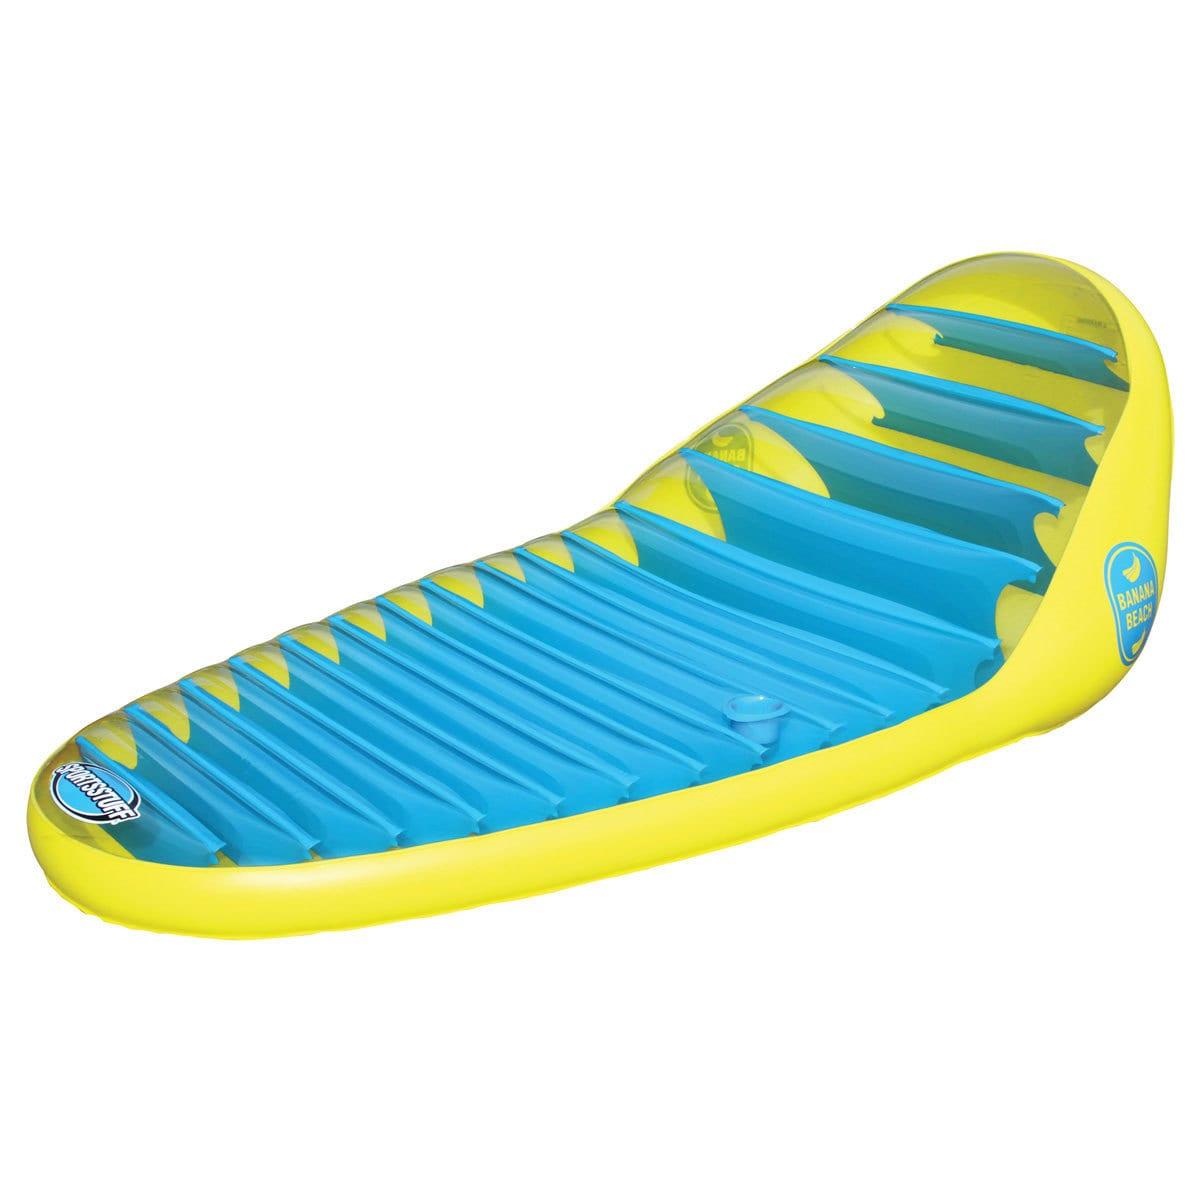 ChairEbay Beach Inflatable Lounge Banana Sportsstuff b6gf7y